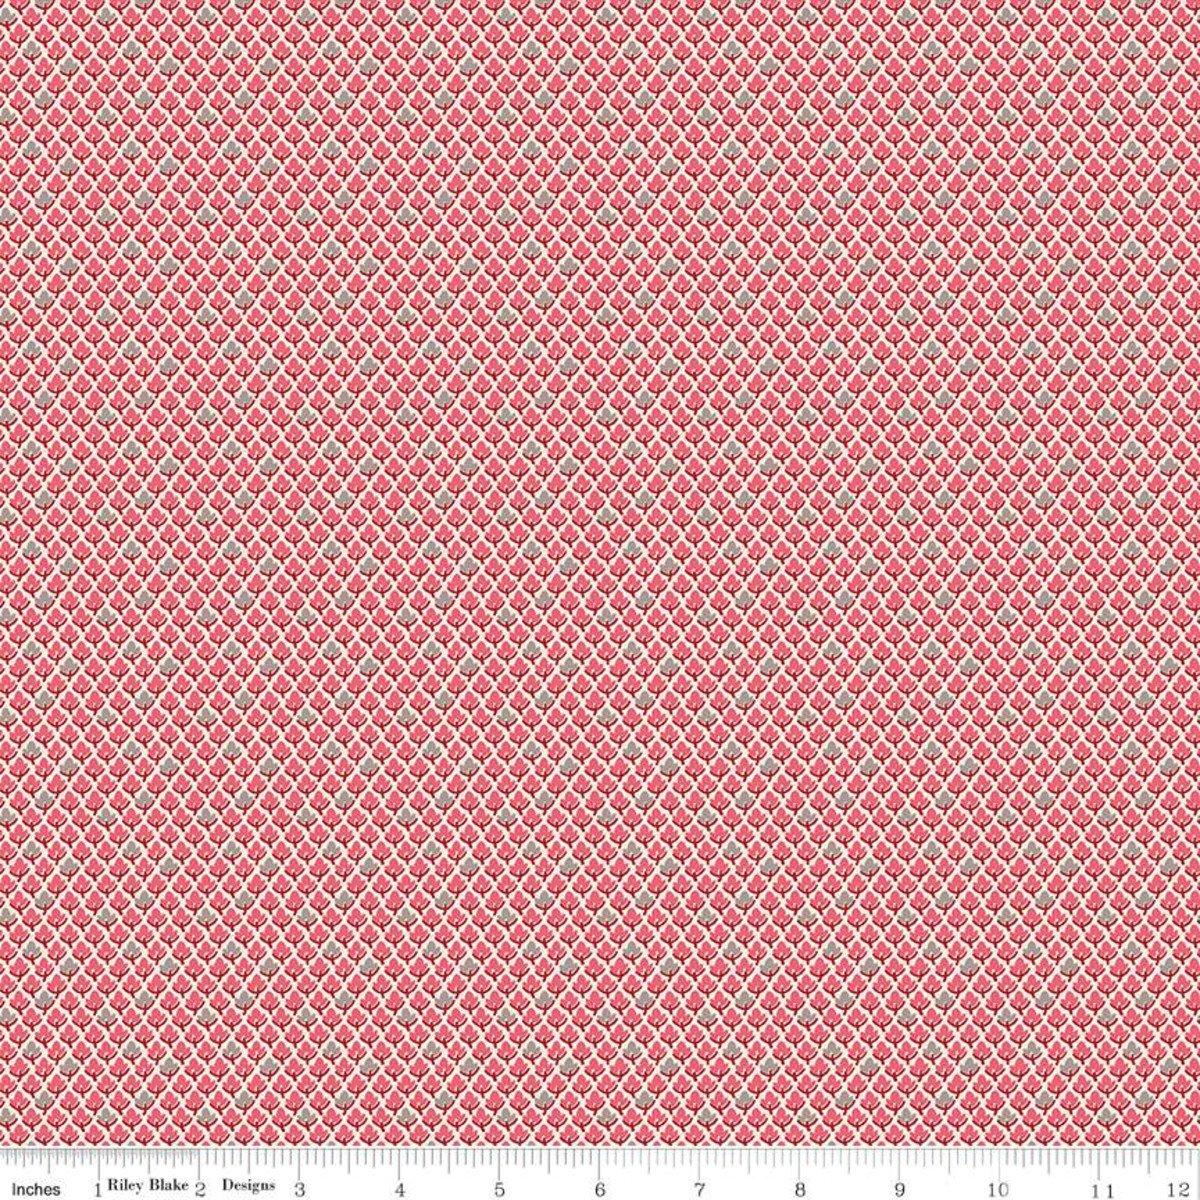 Prim C9700 Leaves Tea Rose by Lori Holt for Riley Blake Designs